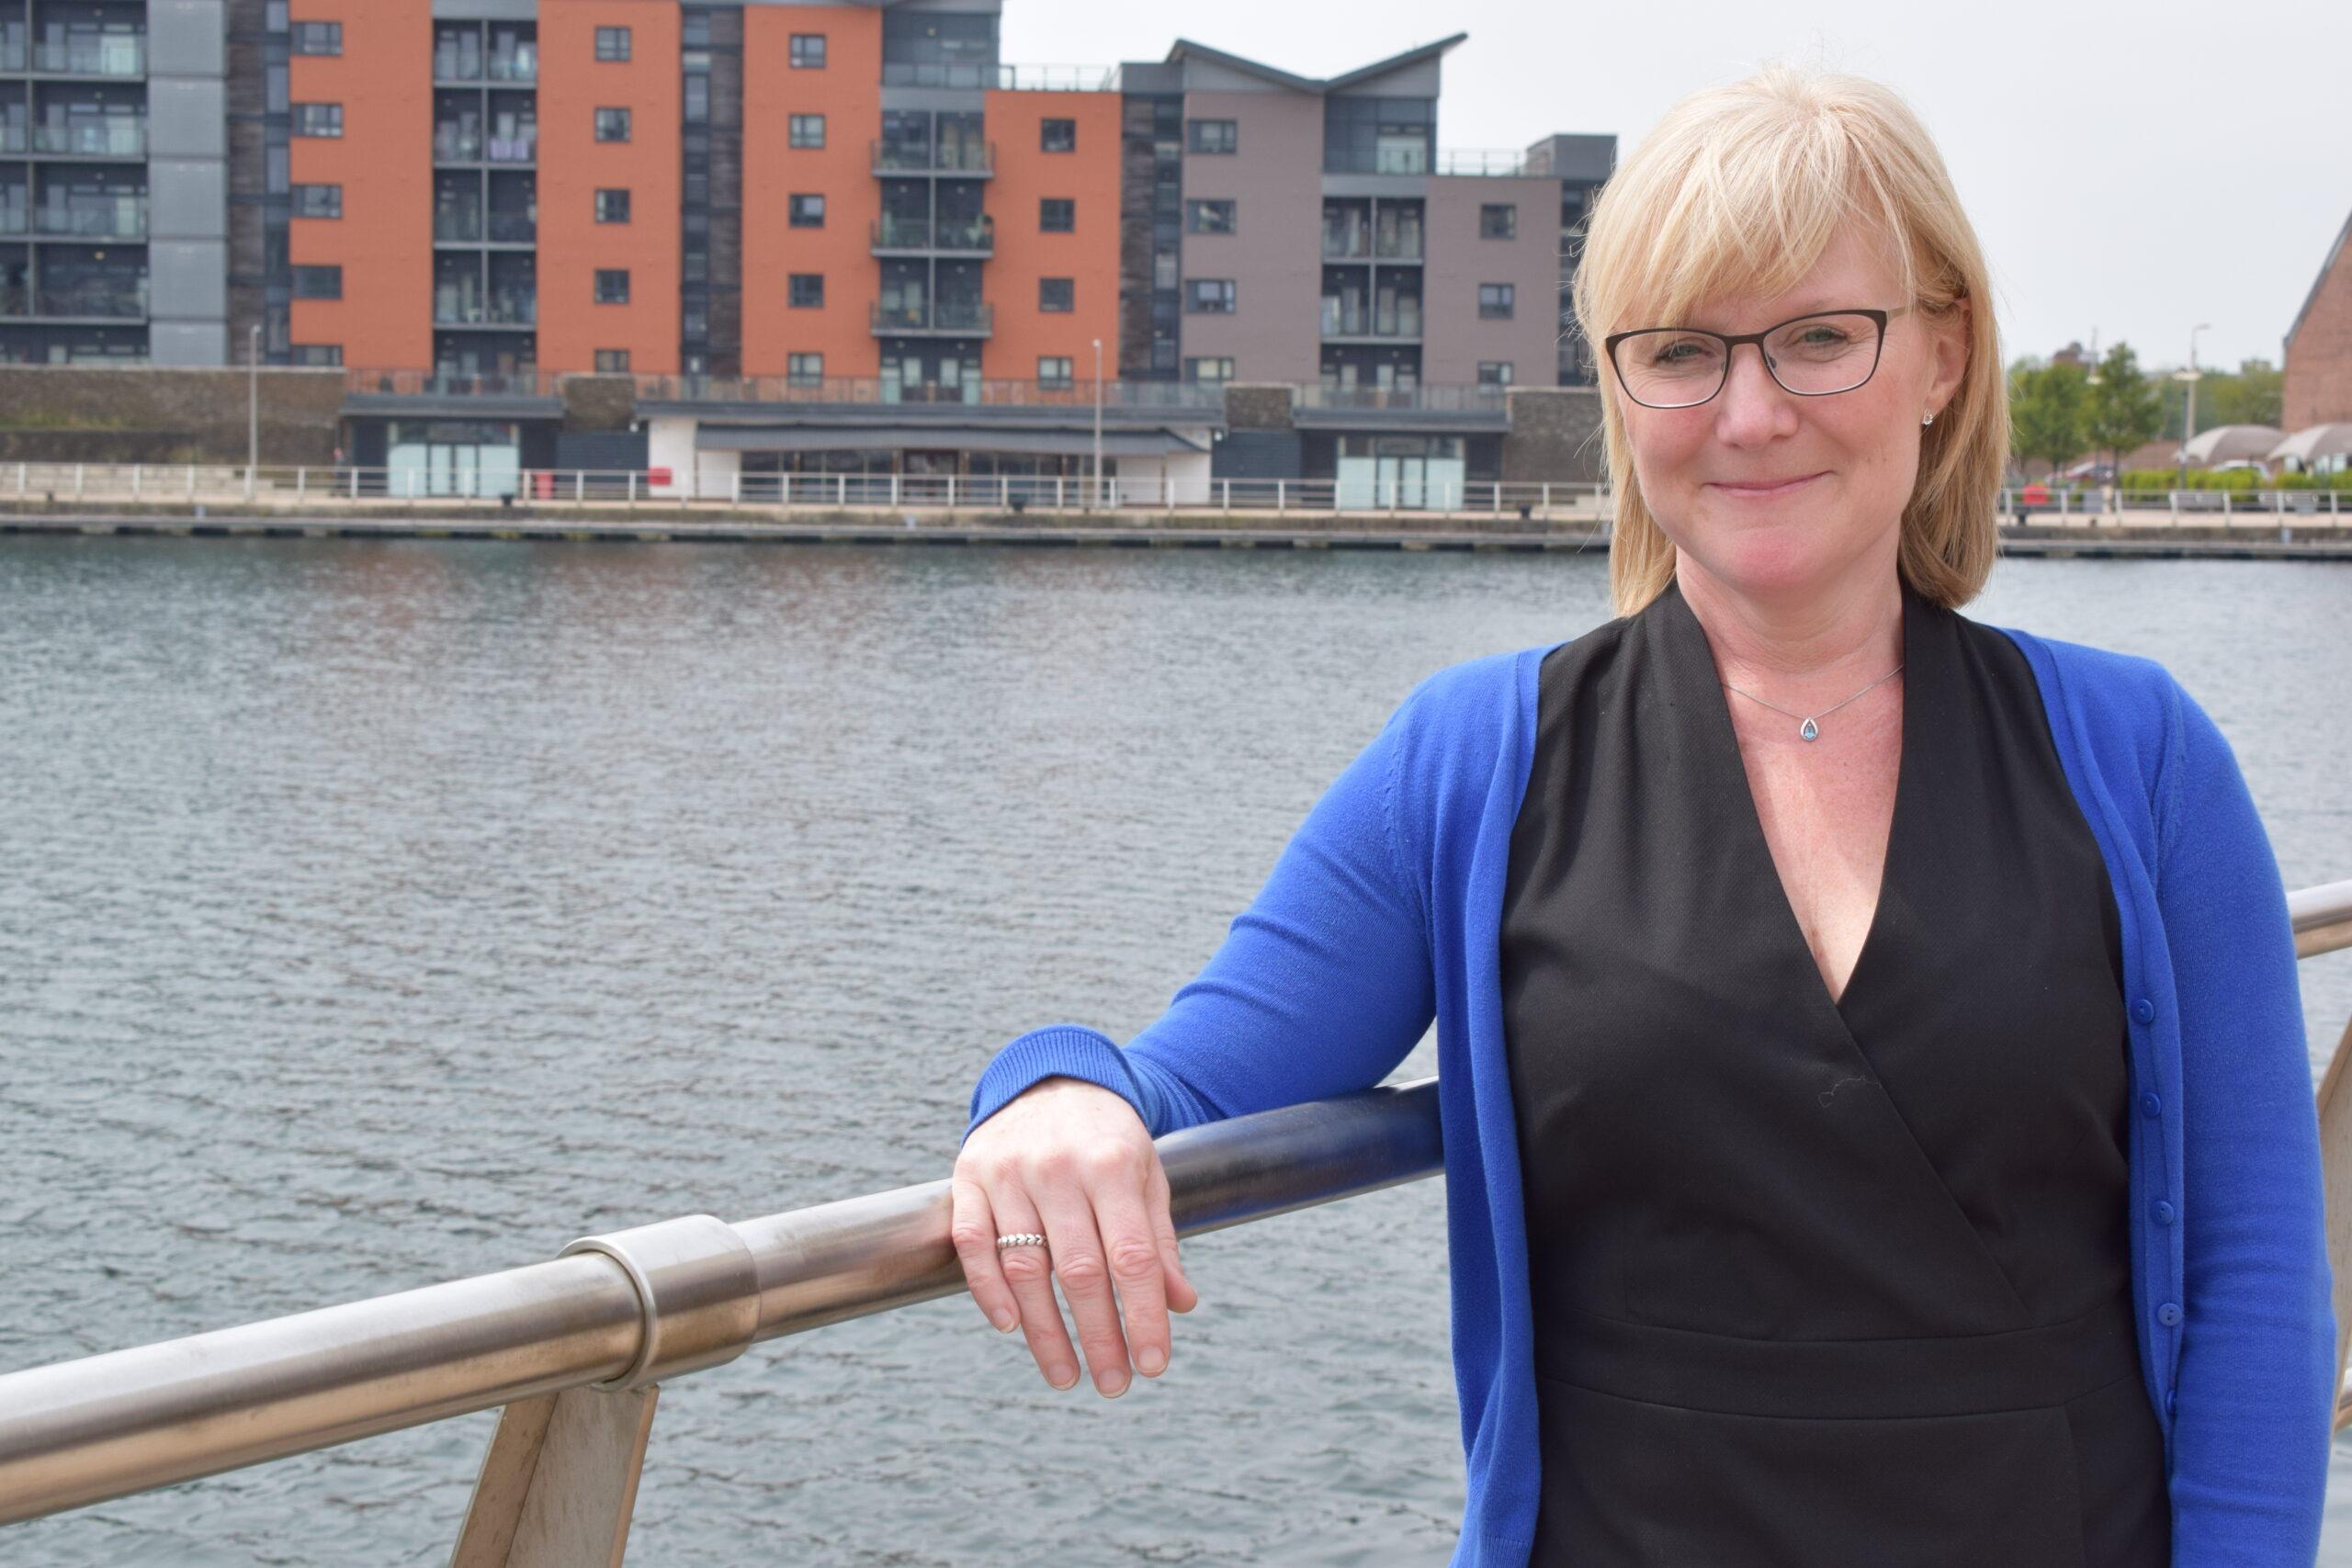 Sara Dennis,Director of Bevan Buckland LLP standing down on Swansea Waterfront